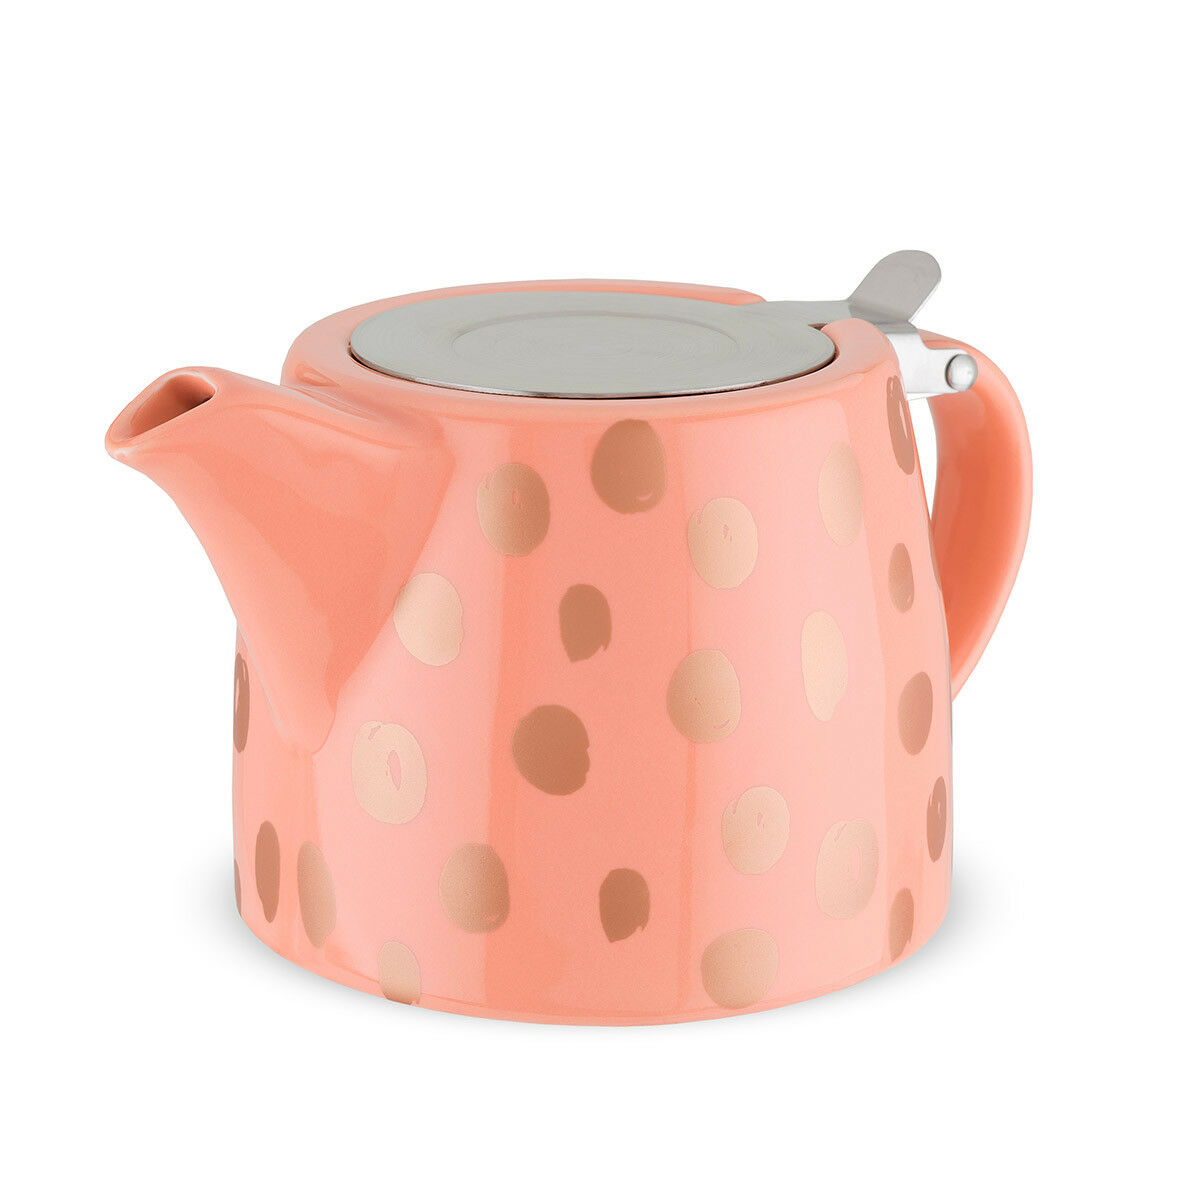 NIB Pinky Up Harper Ceramic Teapot & Infuser 20oz  - Peach w